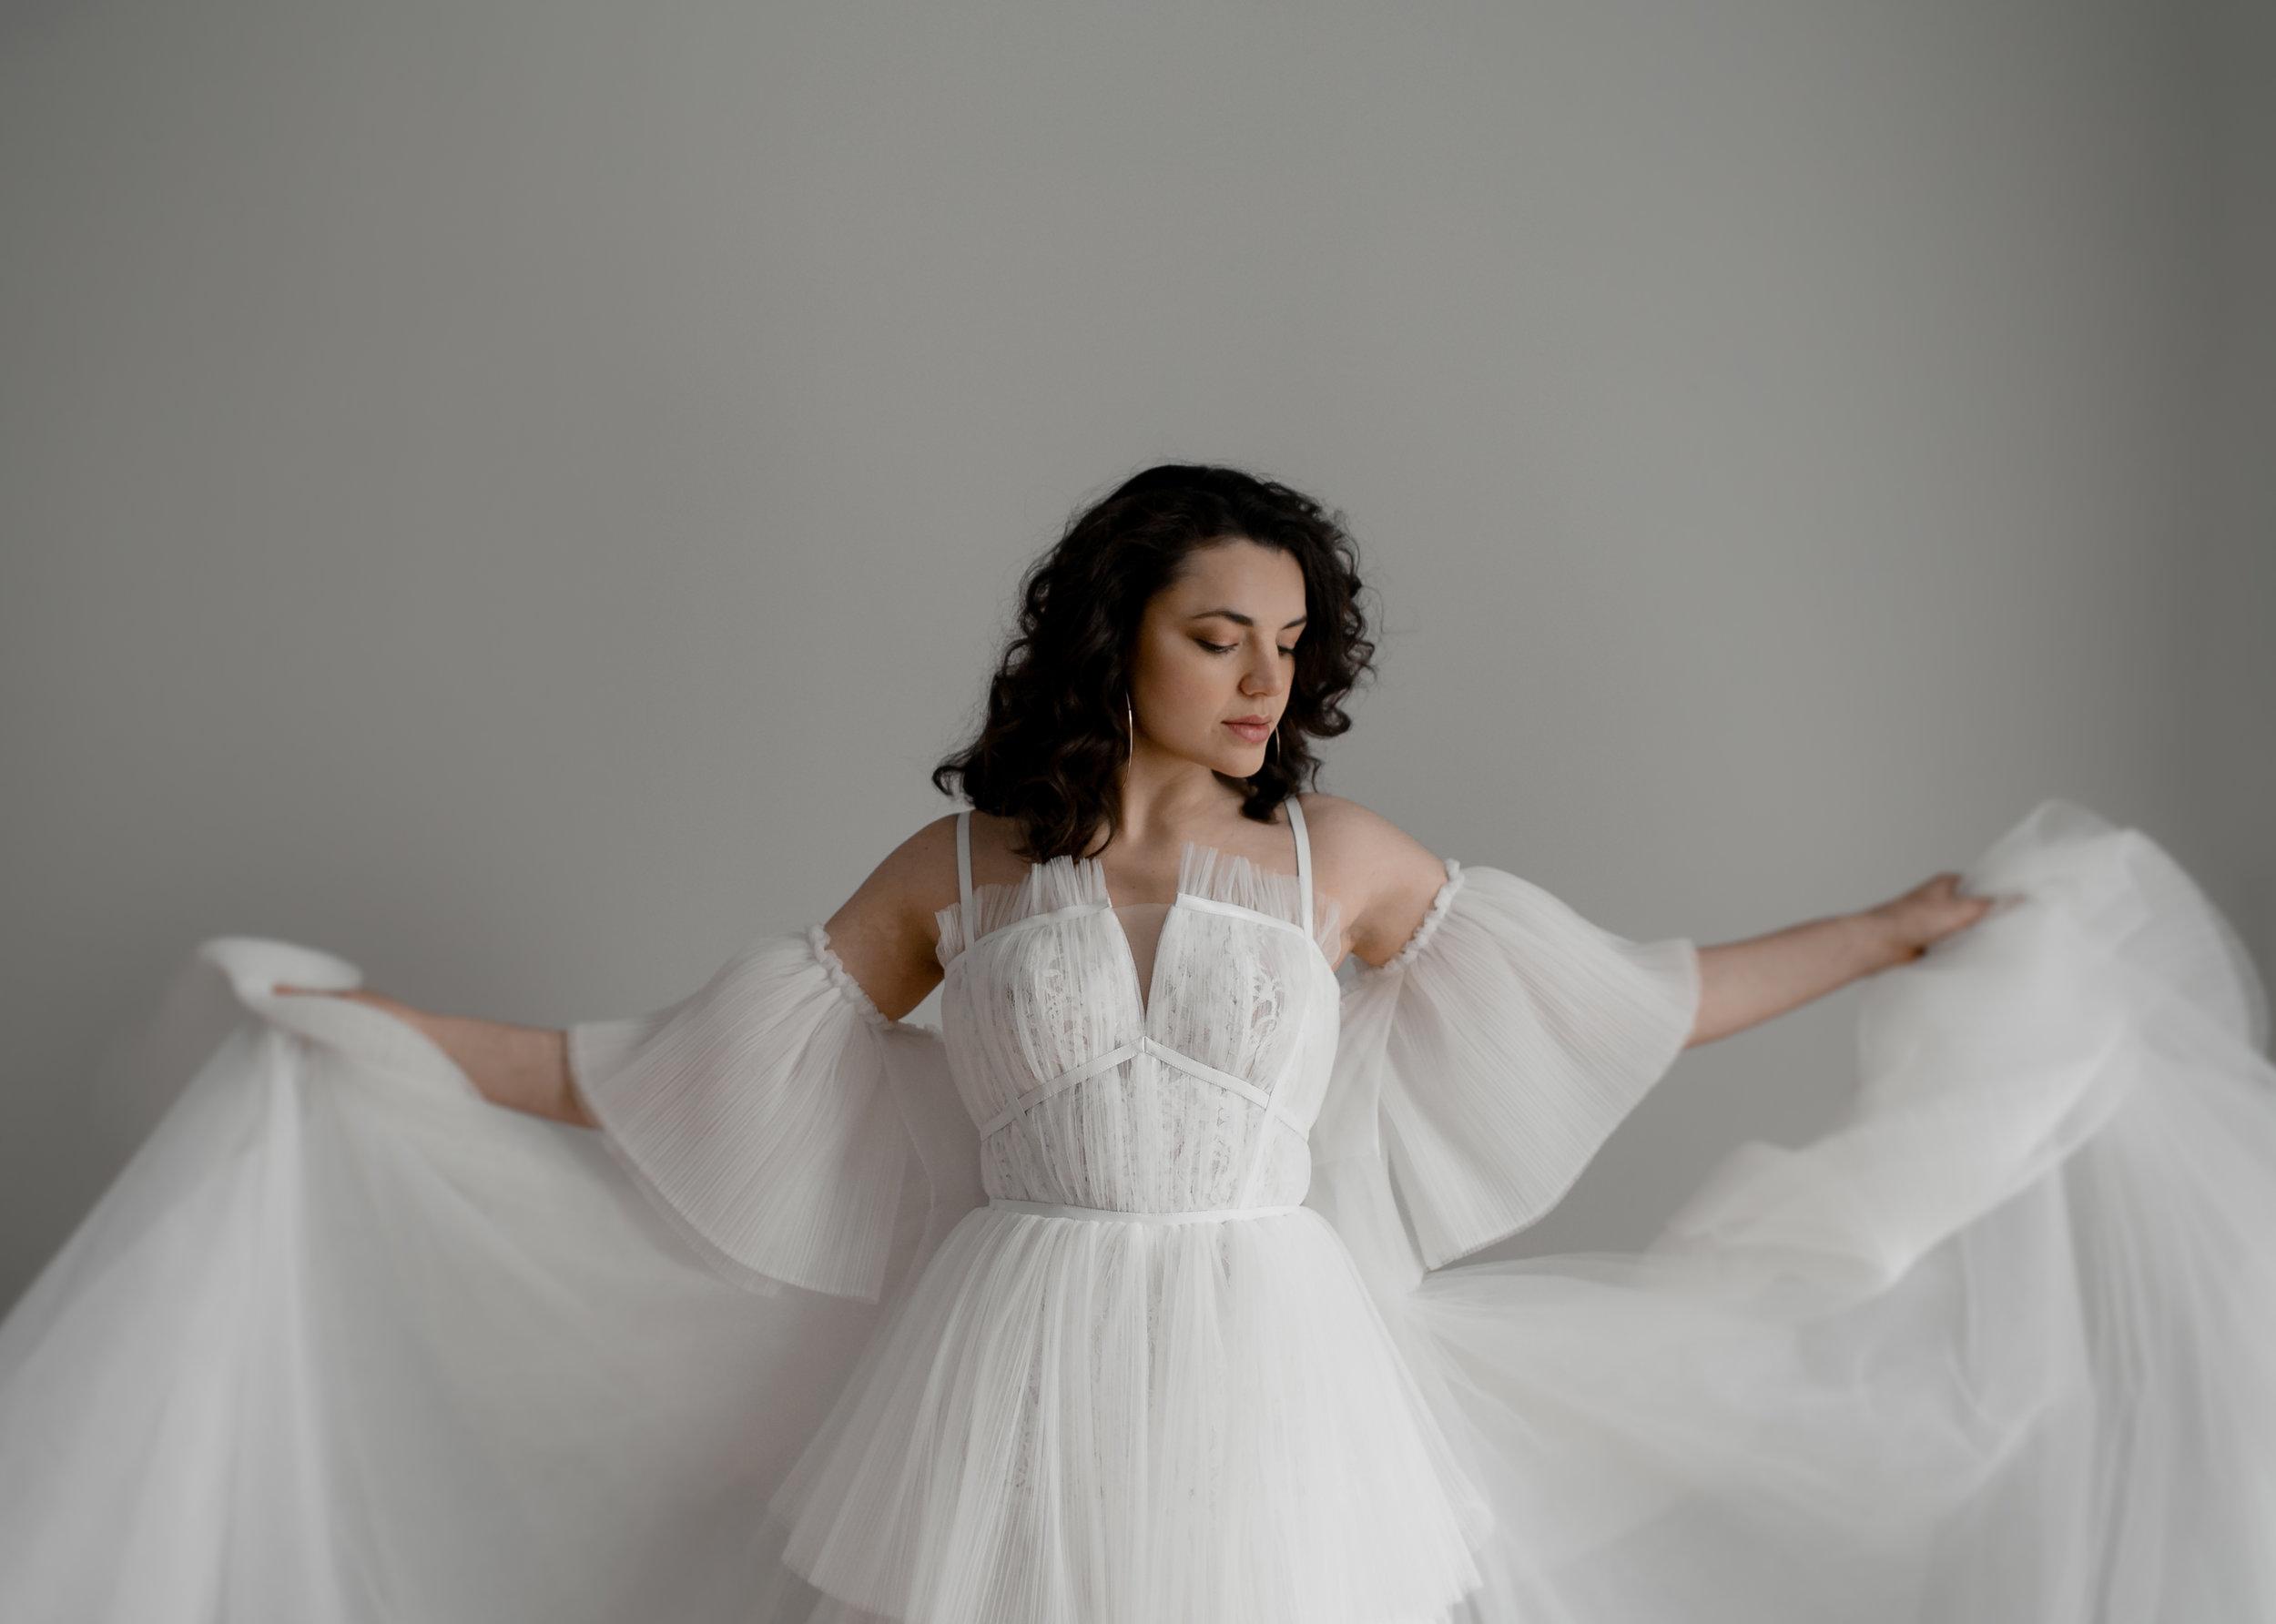 Chicago-Bride-Wedding-Dress-Varca-Edited-504.jpg